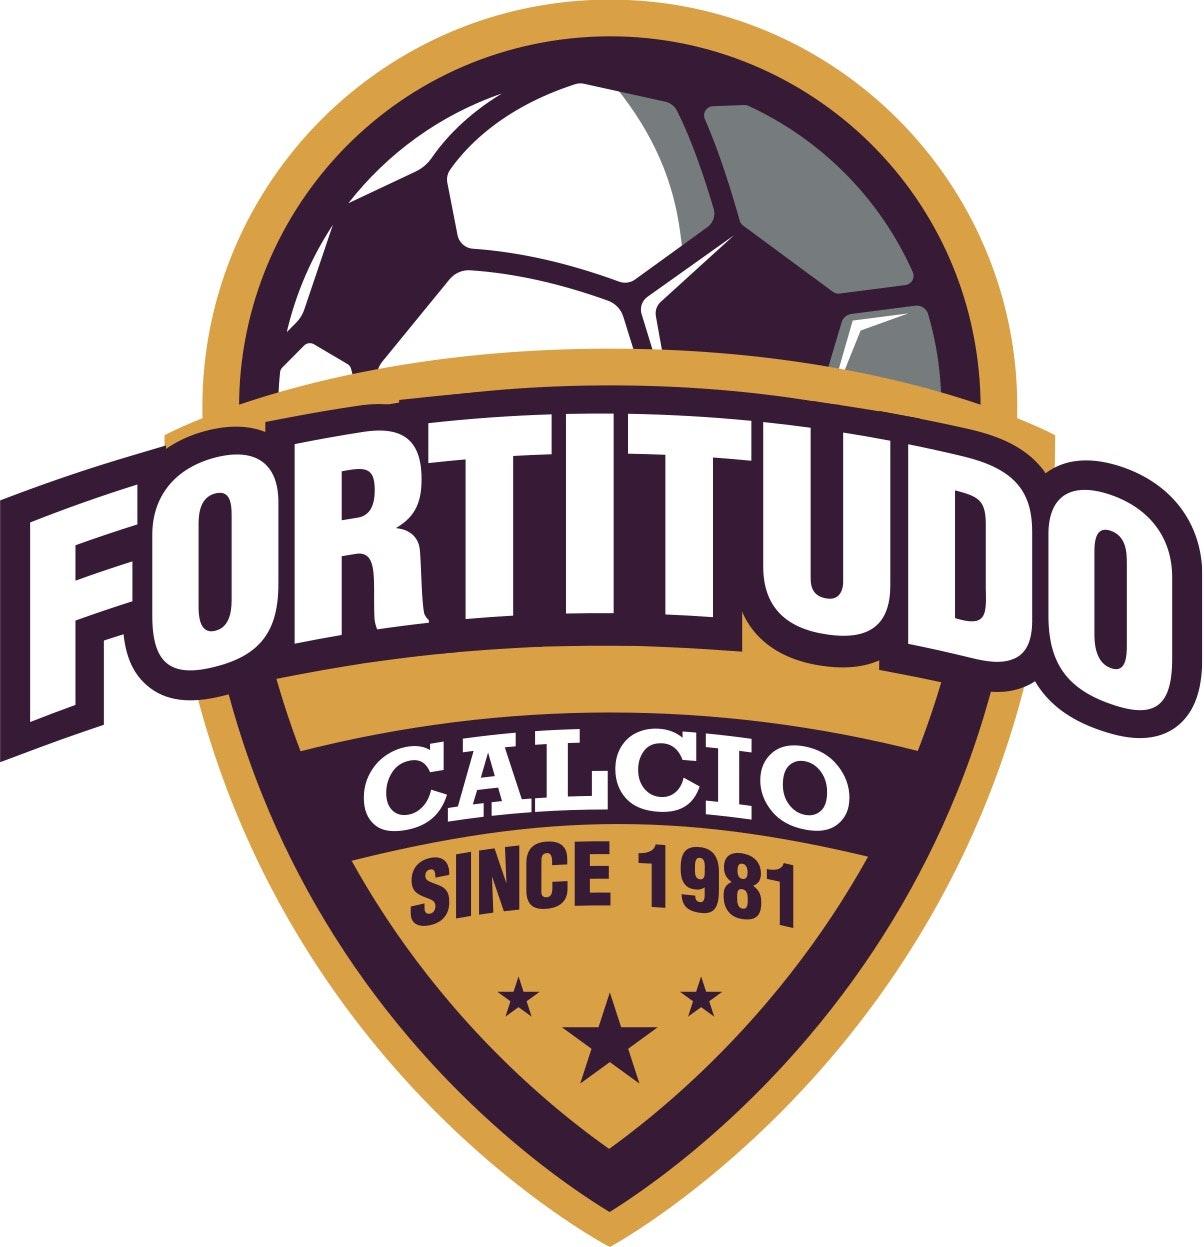 1485685871347593 fortitudo 2